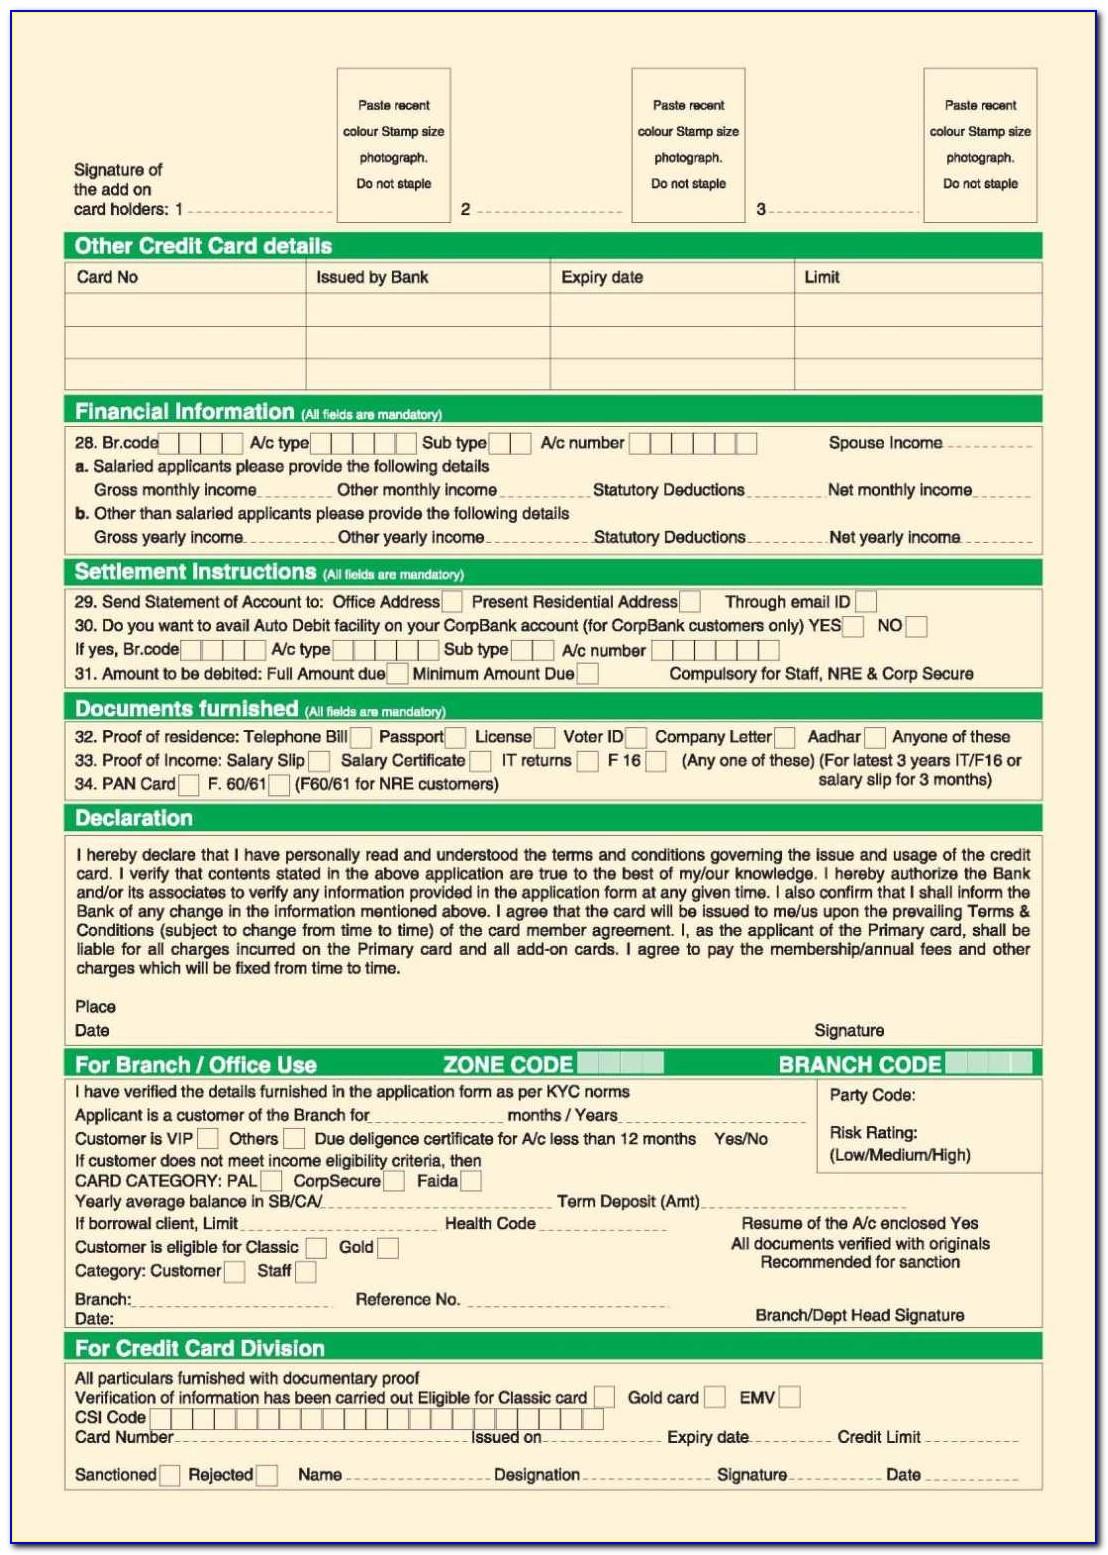 City Union Bank Credit Card Application Form